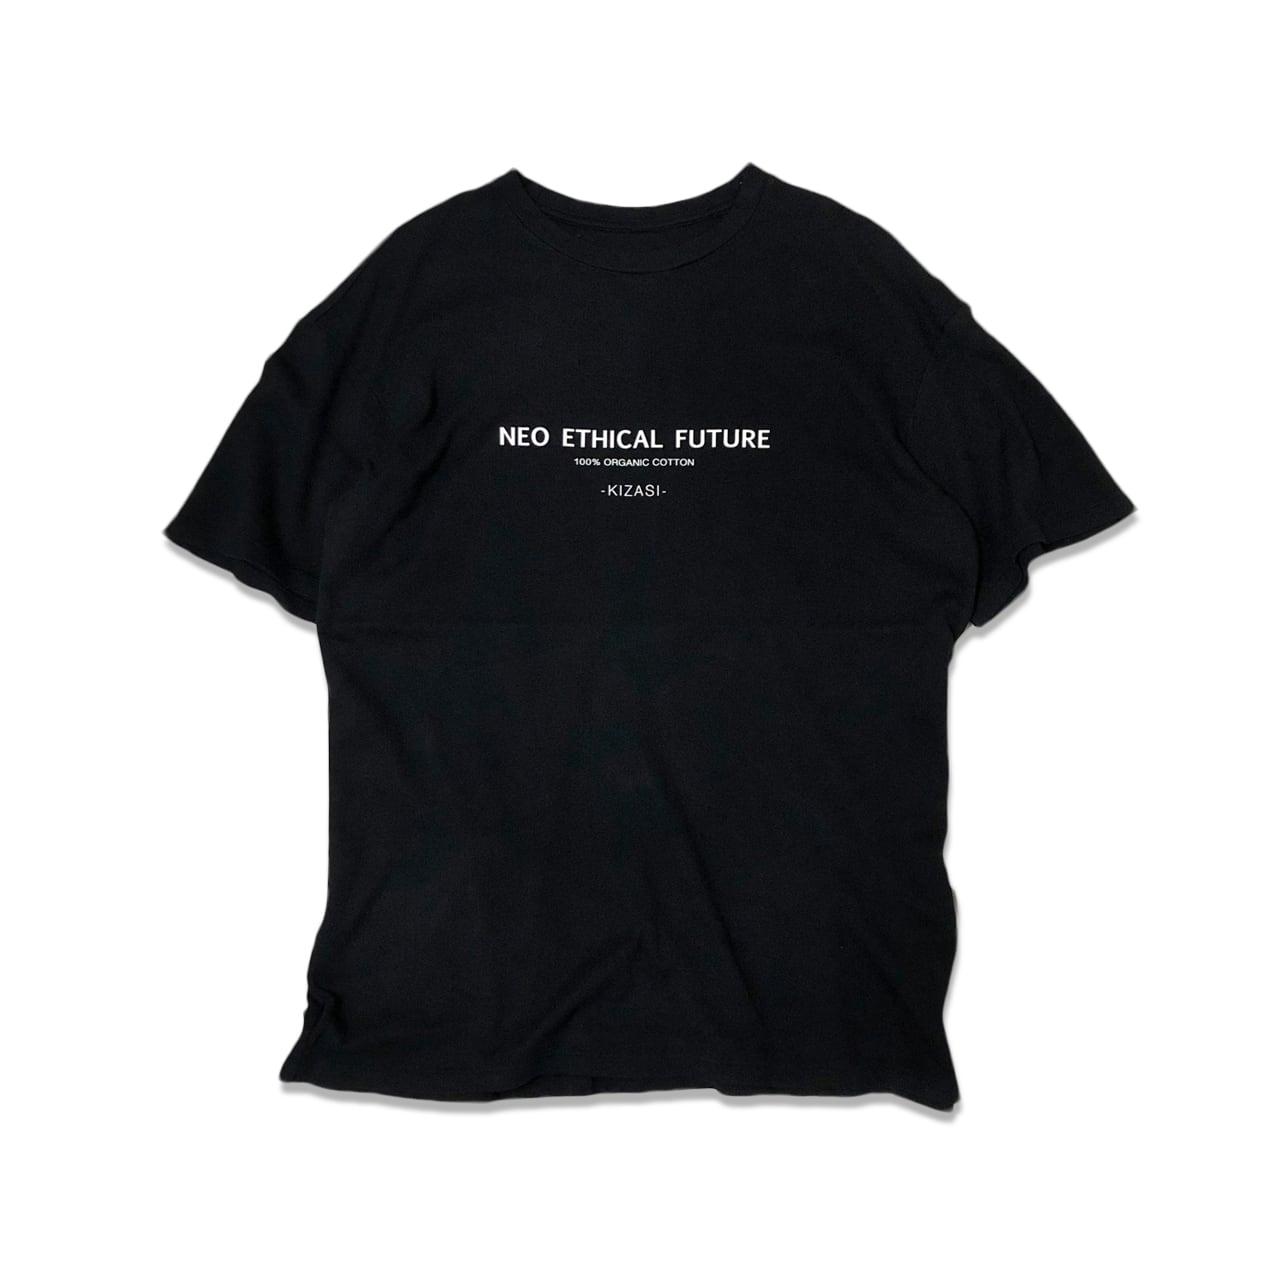 """NEO ETHICAL FUTURE"" オーガニックコットン BIG Tシャツ【予約受付終了】"